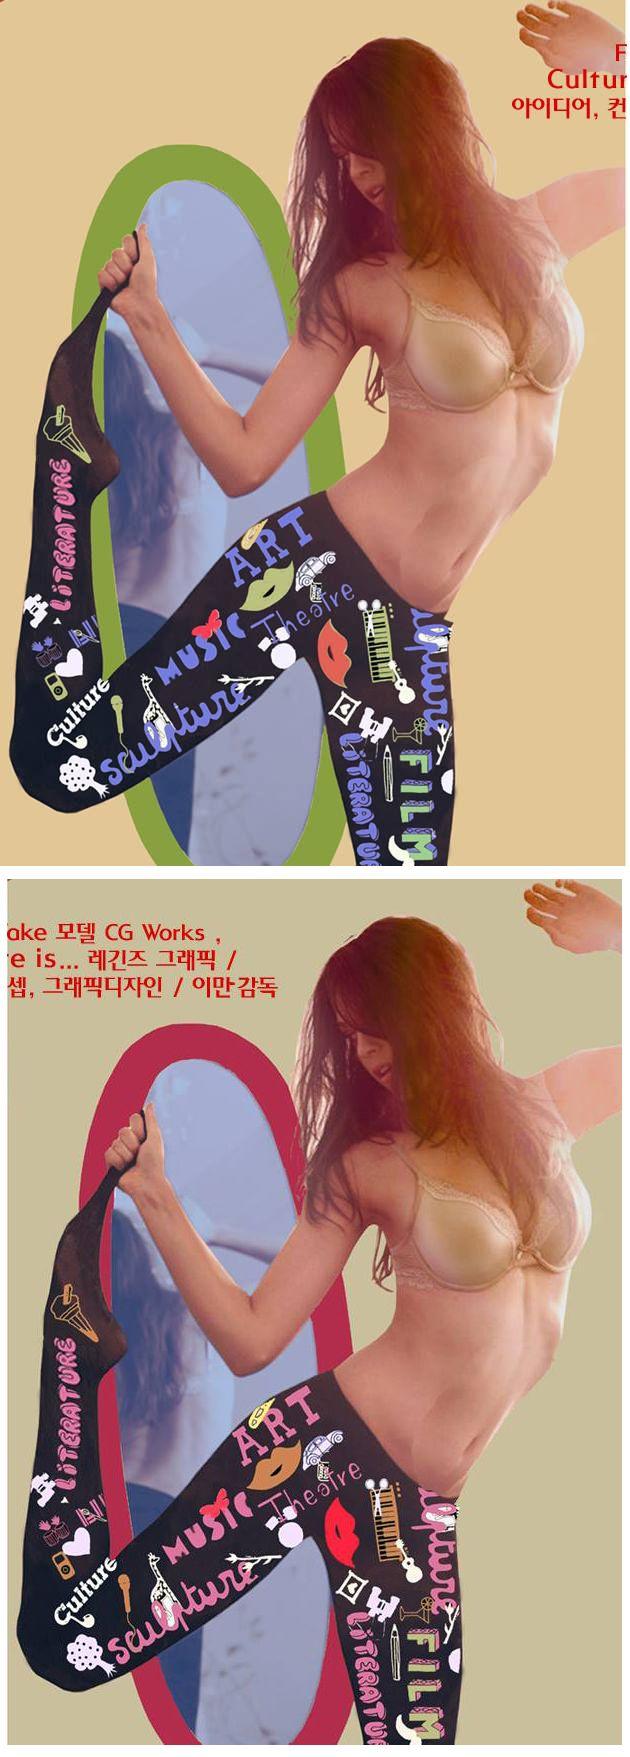 'Culture is .. ' 레긴즈의 그래픽 디자인   젊음의 아이콘인 팝문화(Pop Culture)의   타이포그패피를 활용한 레긴즈 디자인. 이만감독의 아이디어와 CG Works 입니다